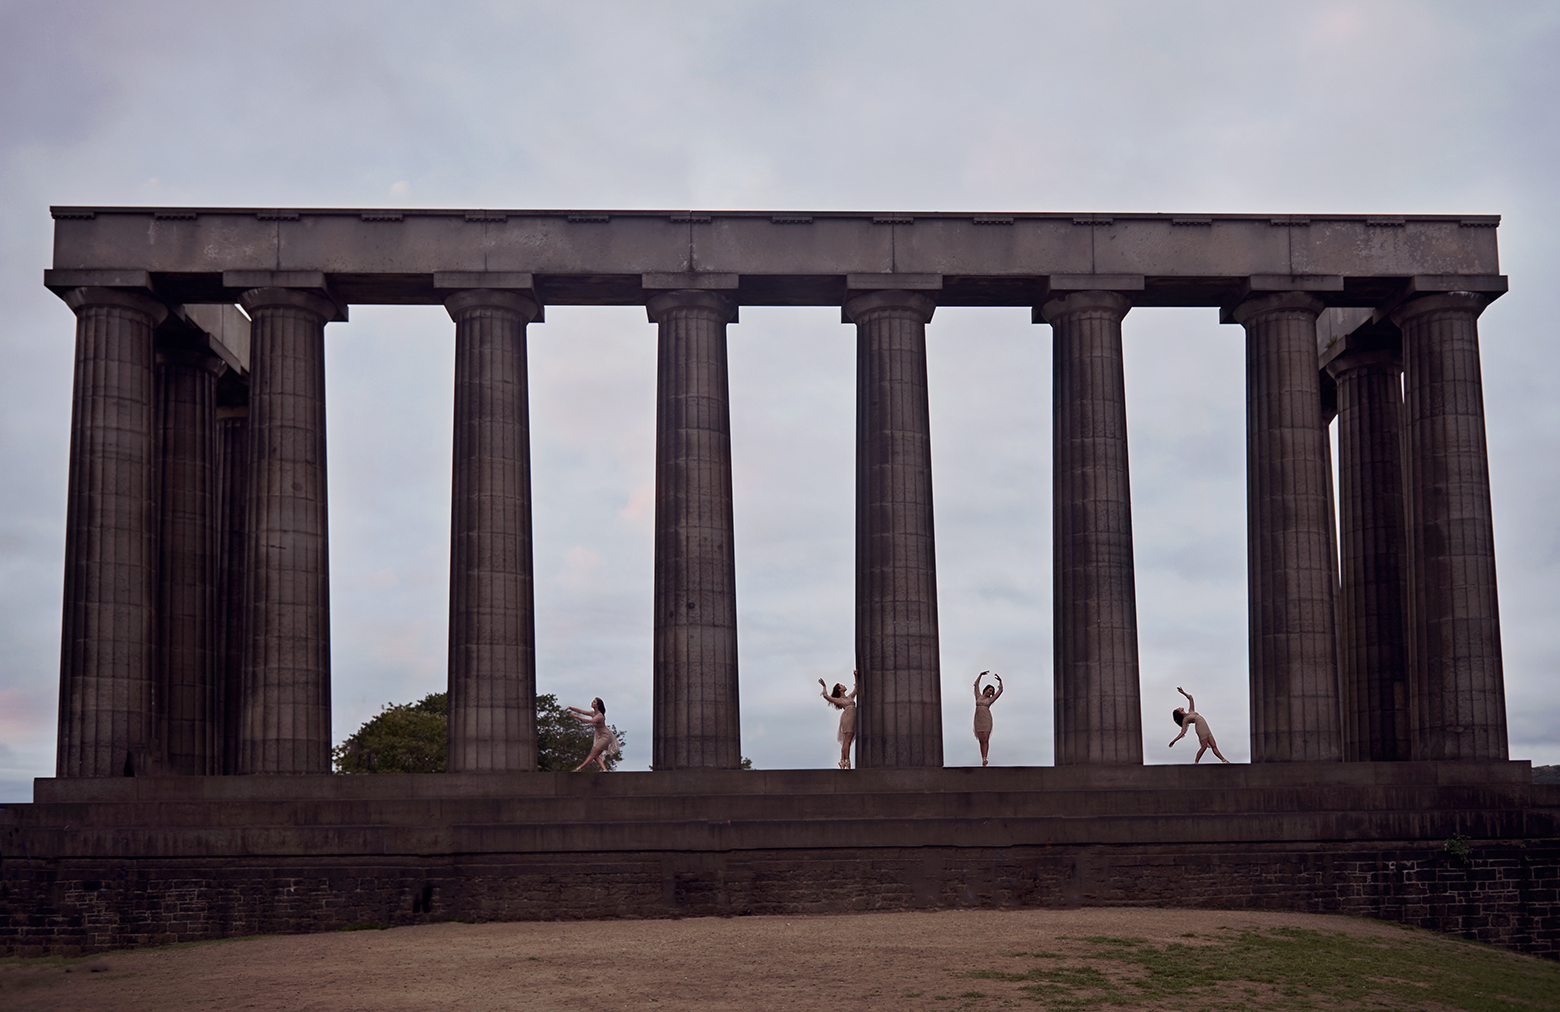 edinburgh, scotland, uk, photos and the city, fringe festival, portrait photography, ursula schmitz, destination scotland